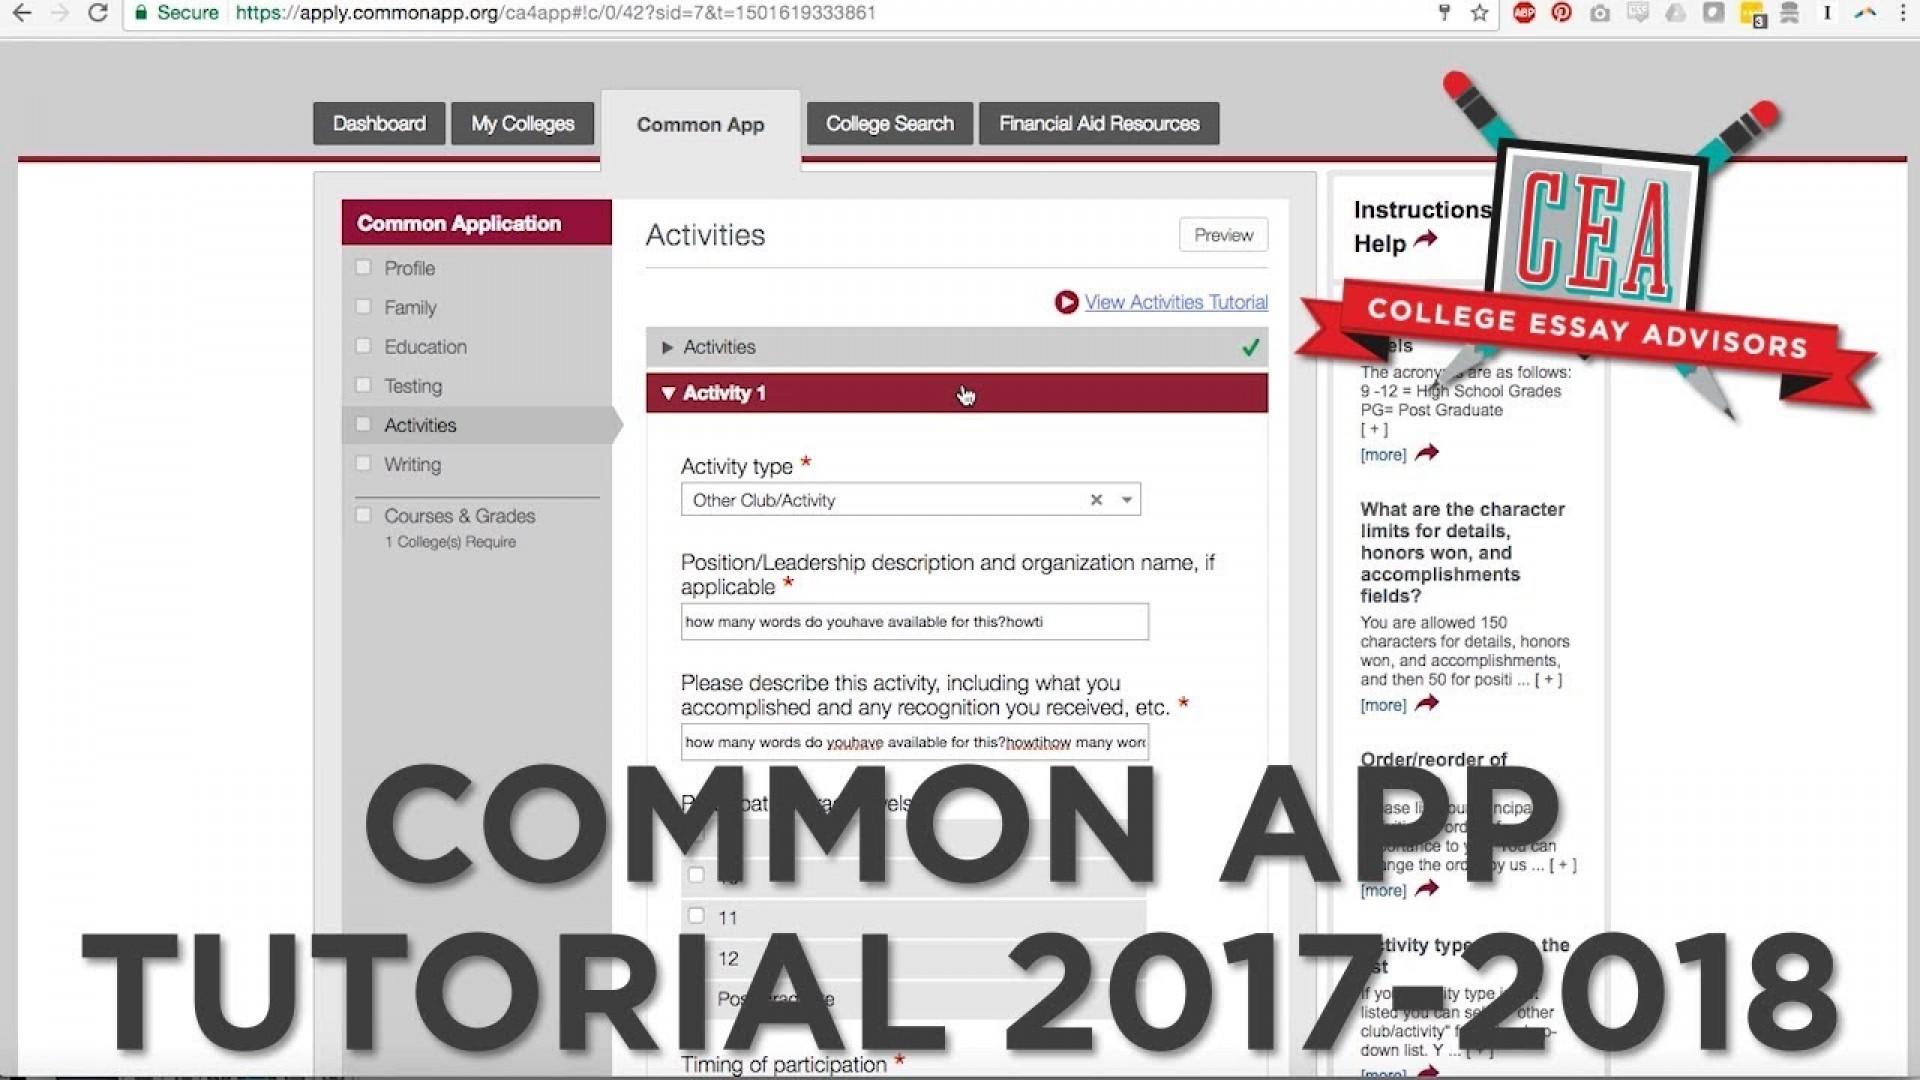 011 College Essays Maxresdefault Essay Frightening 2017 Best Prompts Boston Scholarship 1920